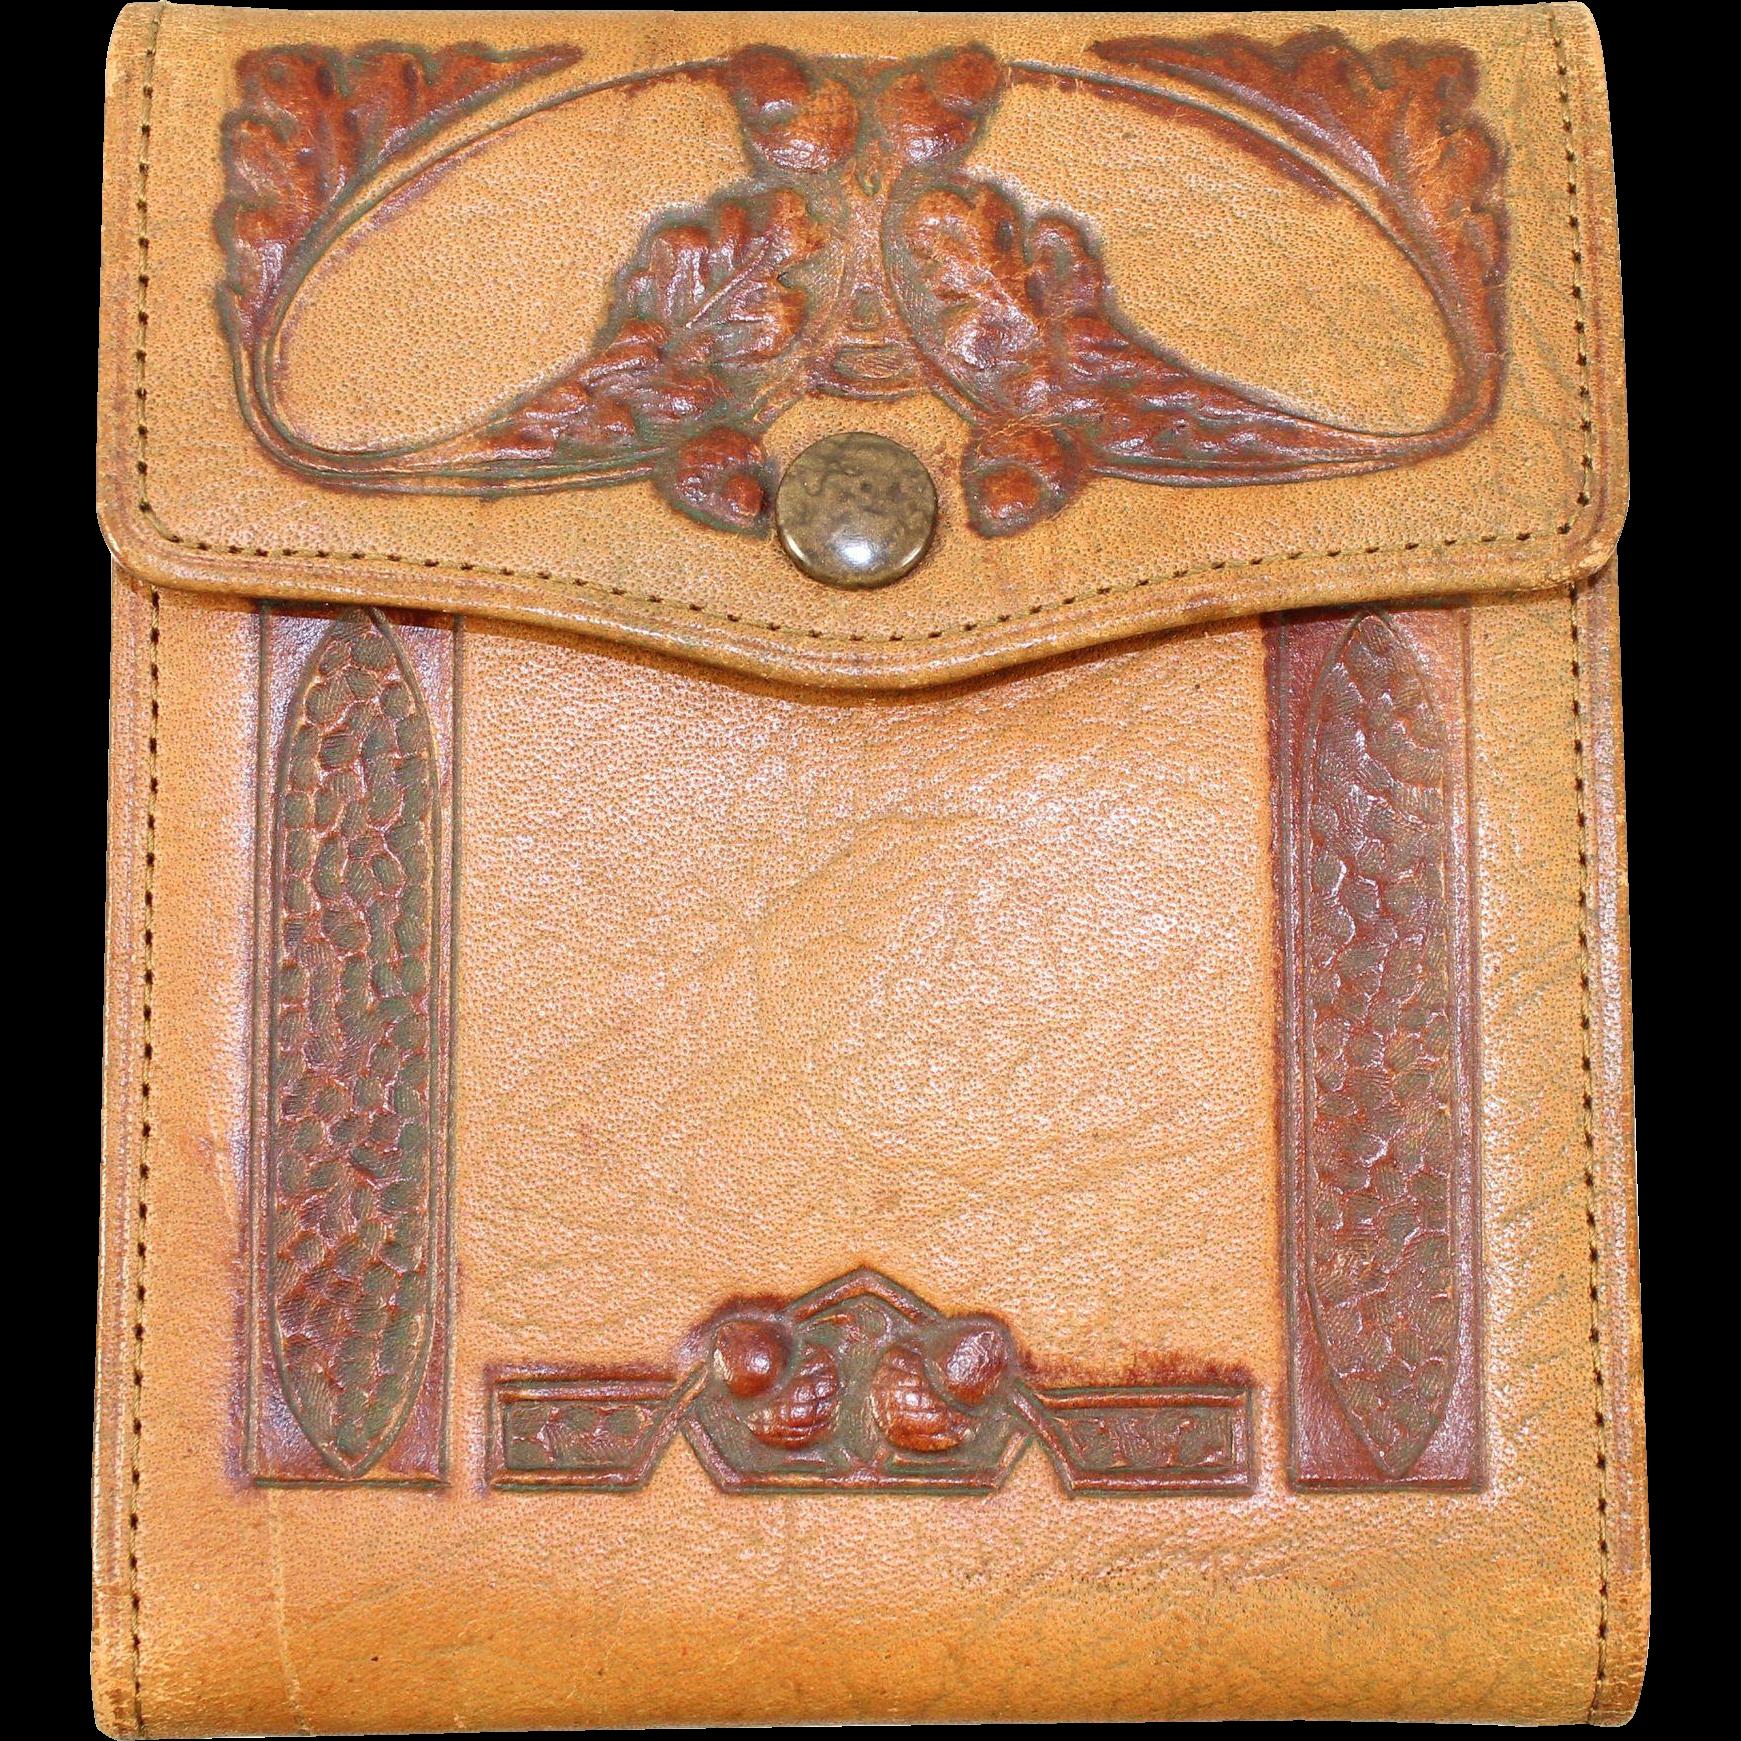 "Vintage 20s/30s Prohibition-Era Tooled Leather Wallet ""Schussler Packing Co."""